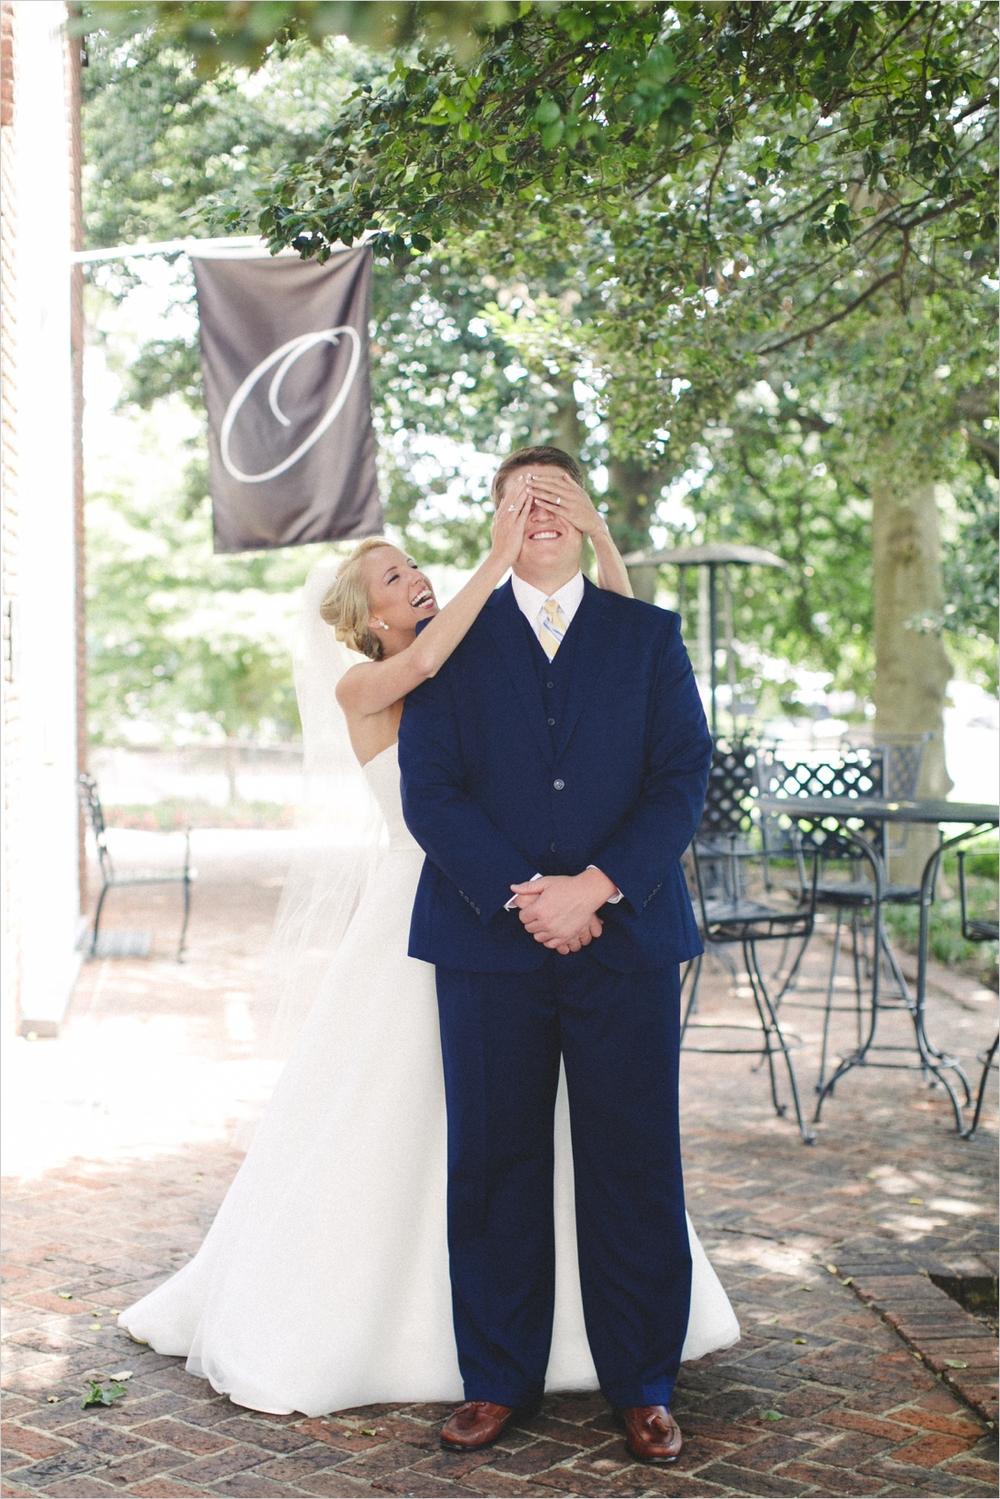 jess_tyler-bright-cheery-richmond-virginia-wedding_0010